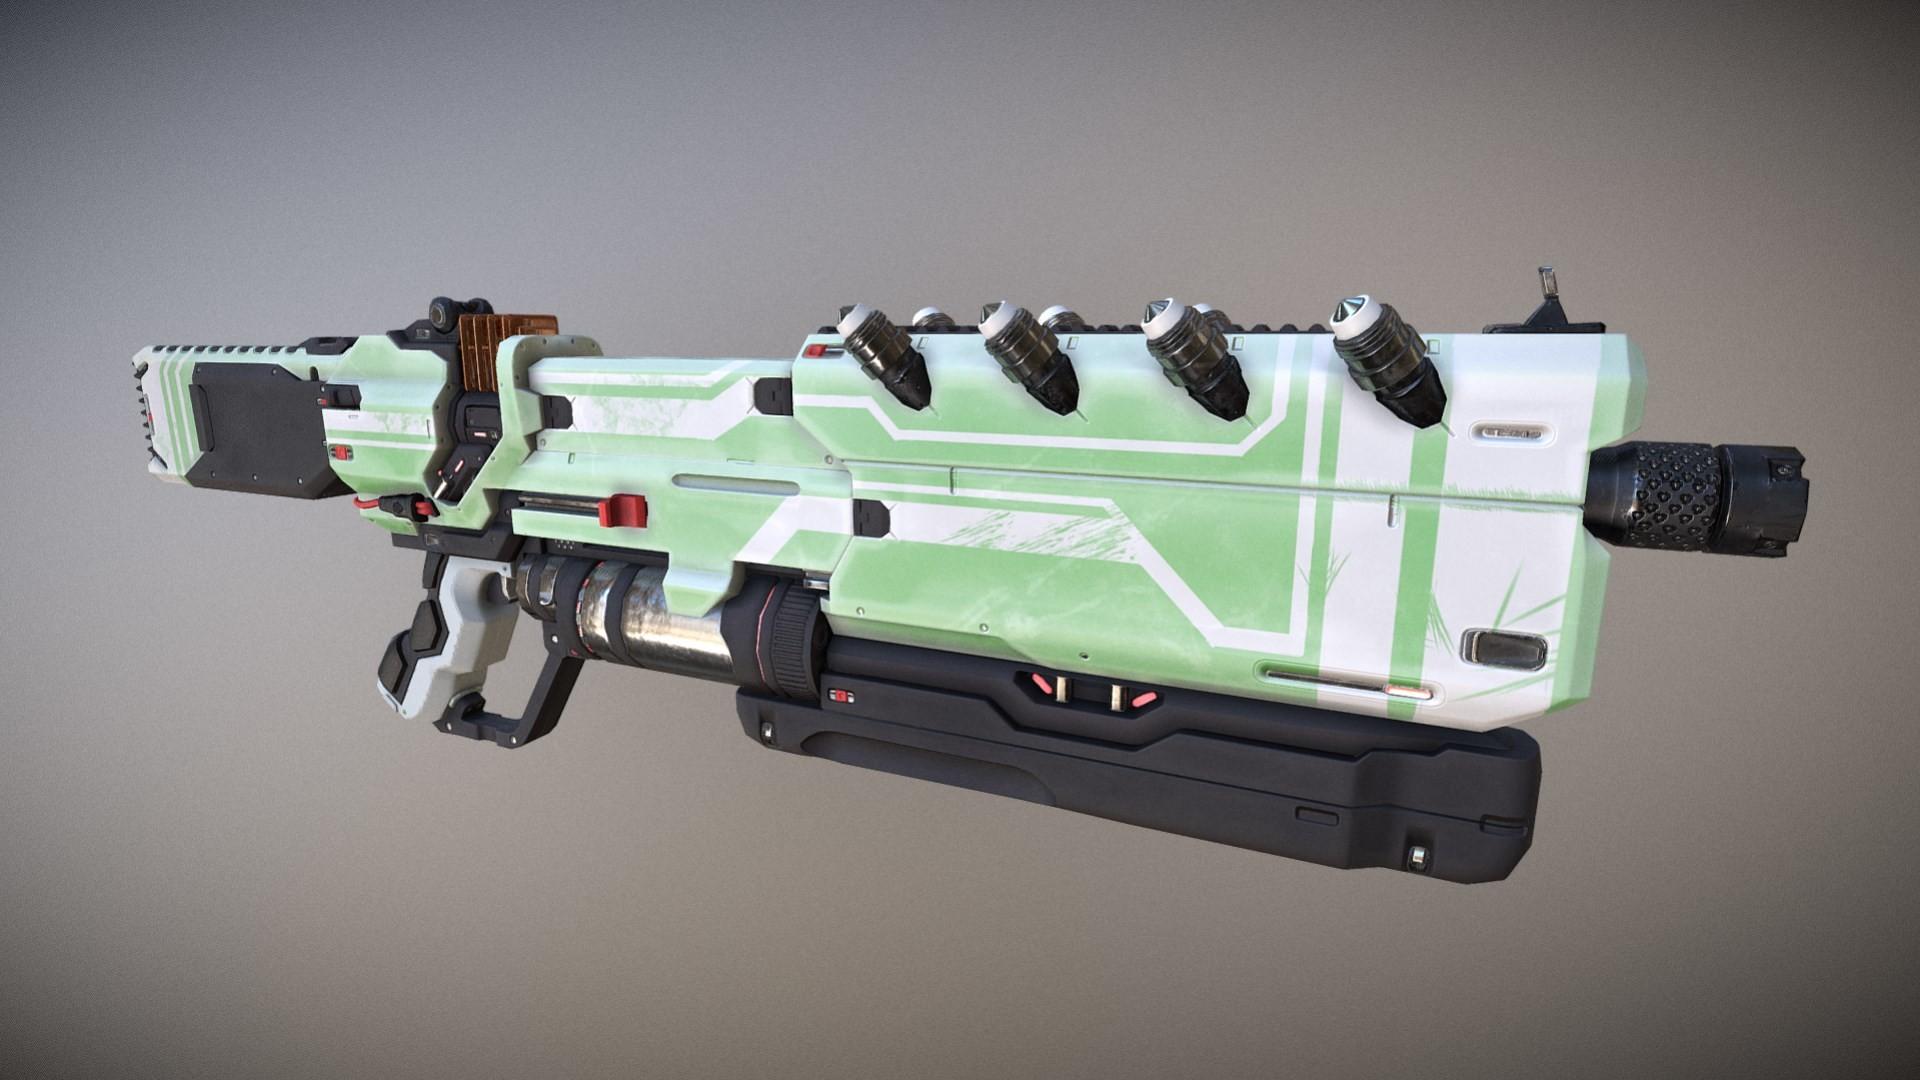 Aivis ozols energyweapon01